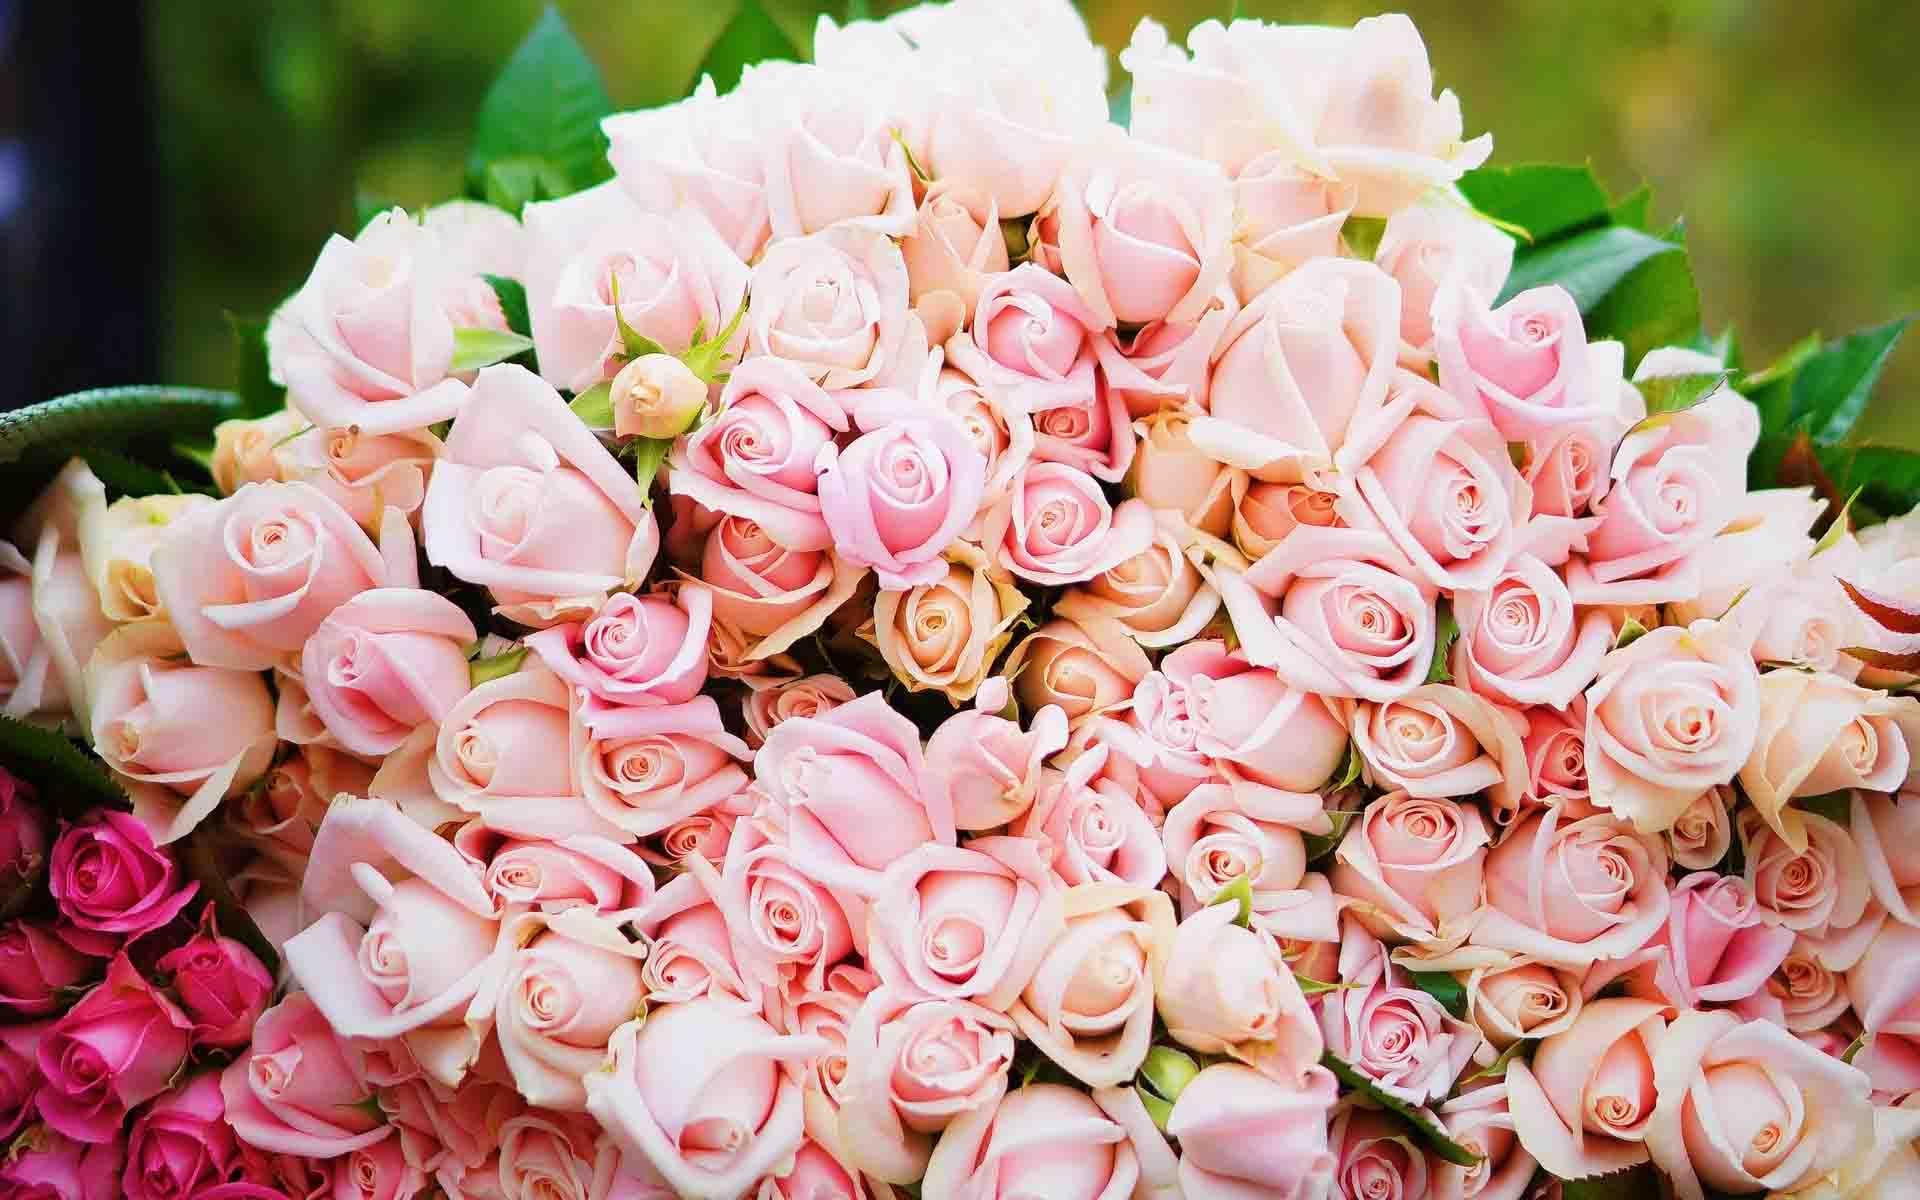 Tenderness Flower Wallpaper Wallpaper Stores Flowers